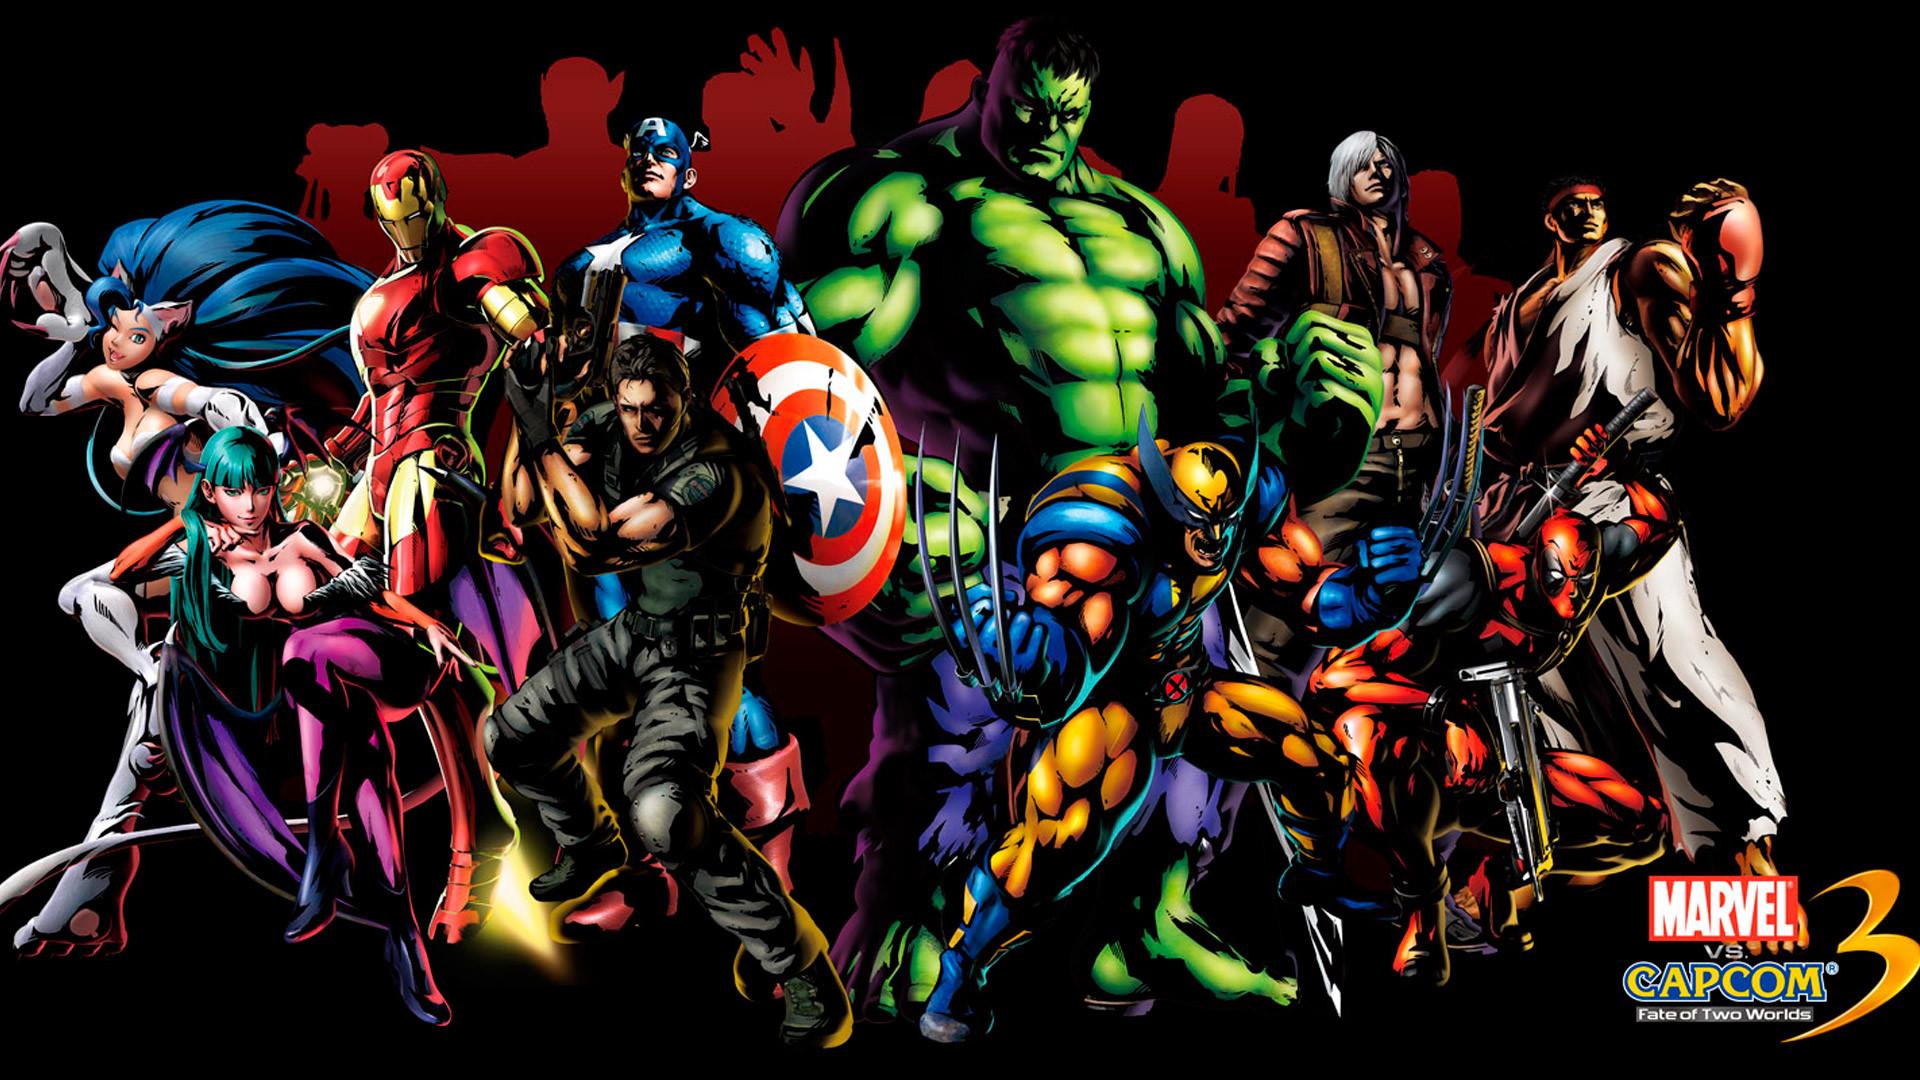 Marvel Wallpapers ID: IOM9999